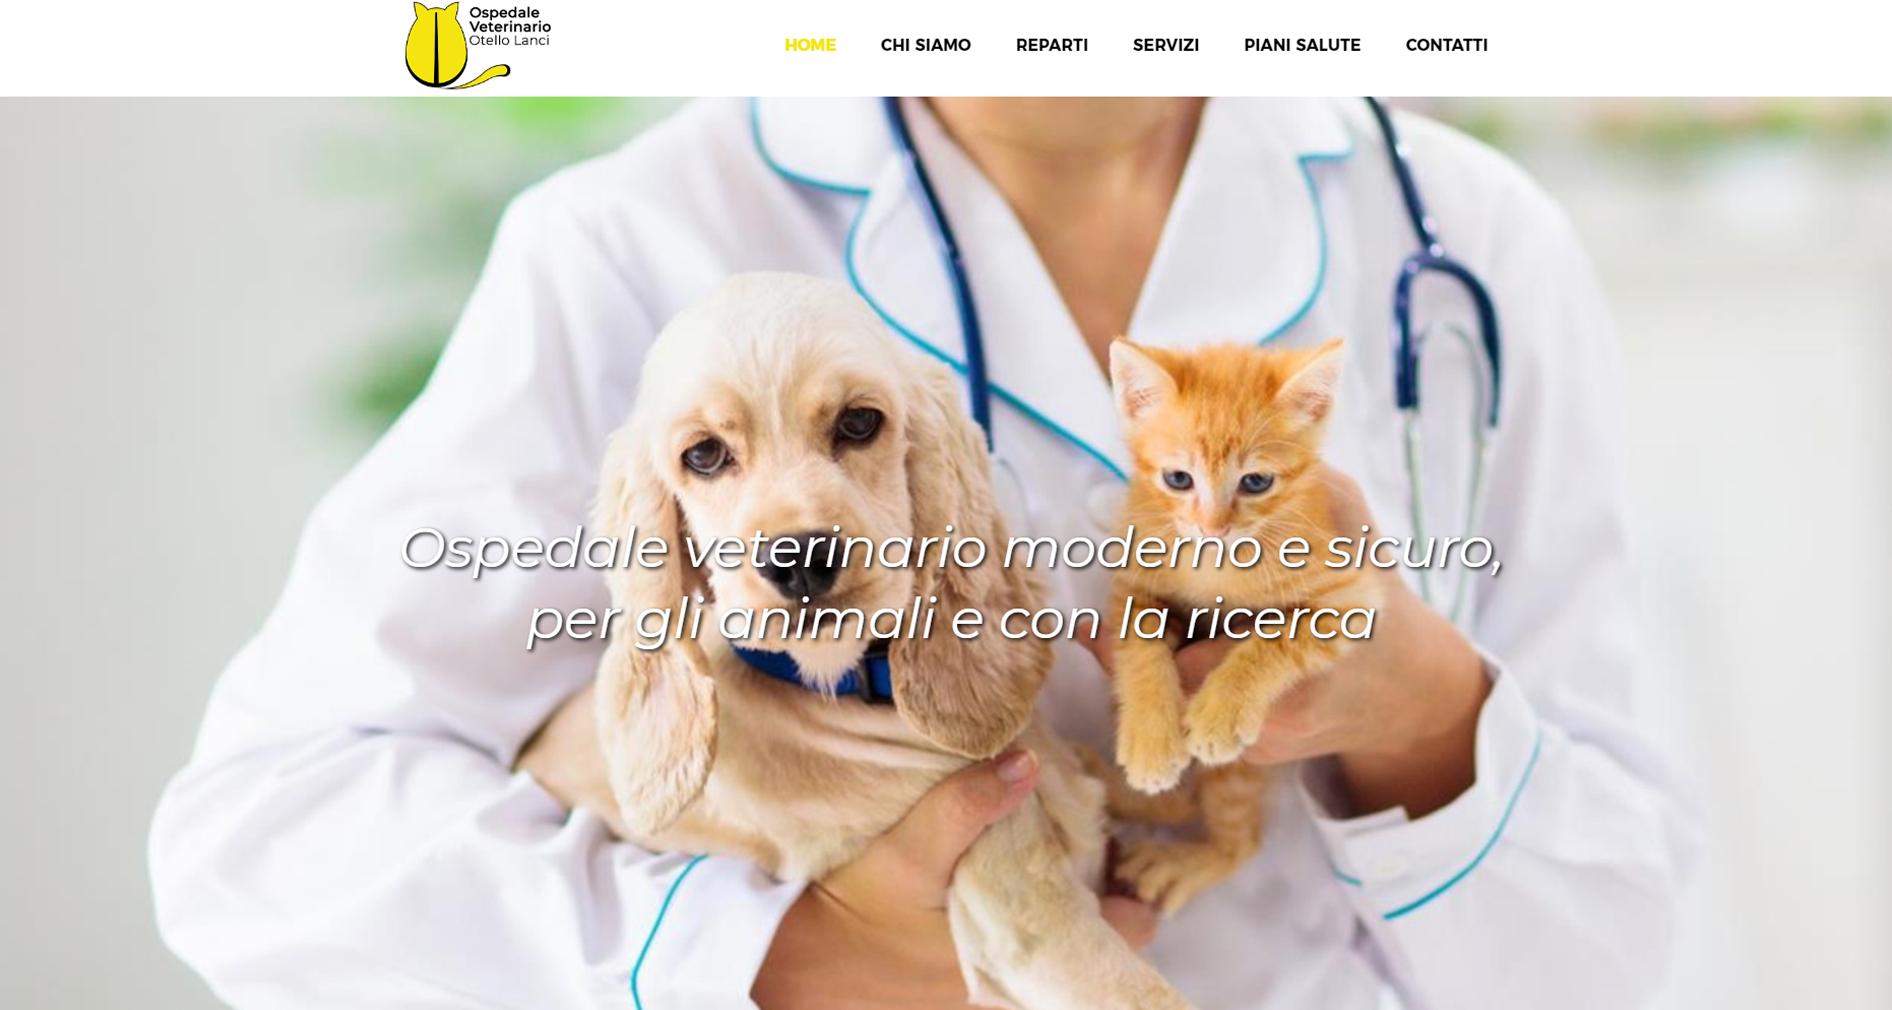 Ospedale Veterinario Lanci - Gianluca De Bianchi - Jeanzilla